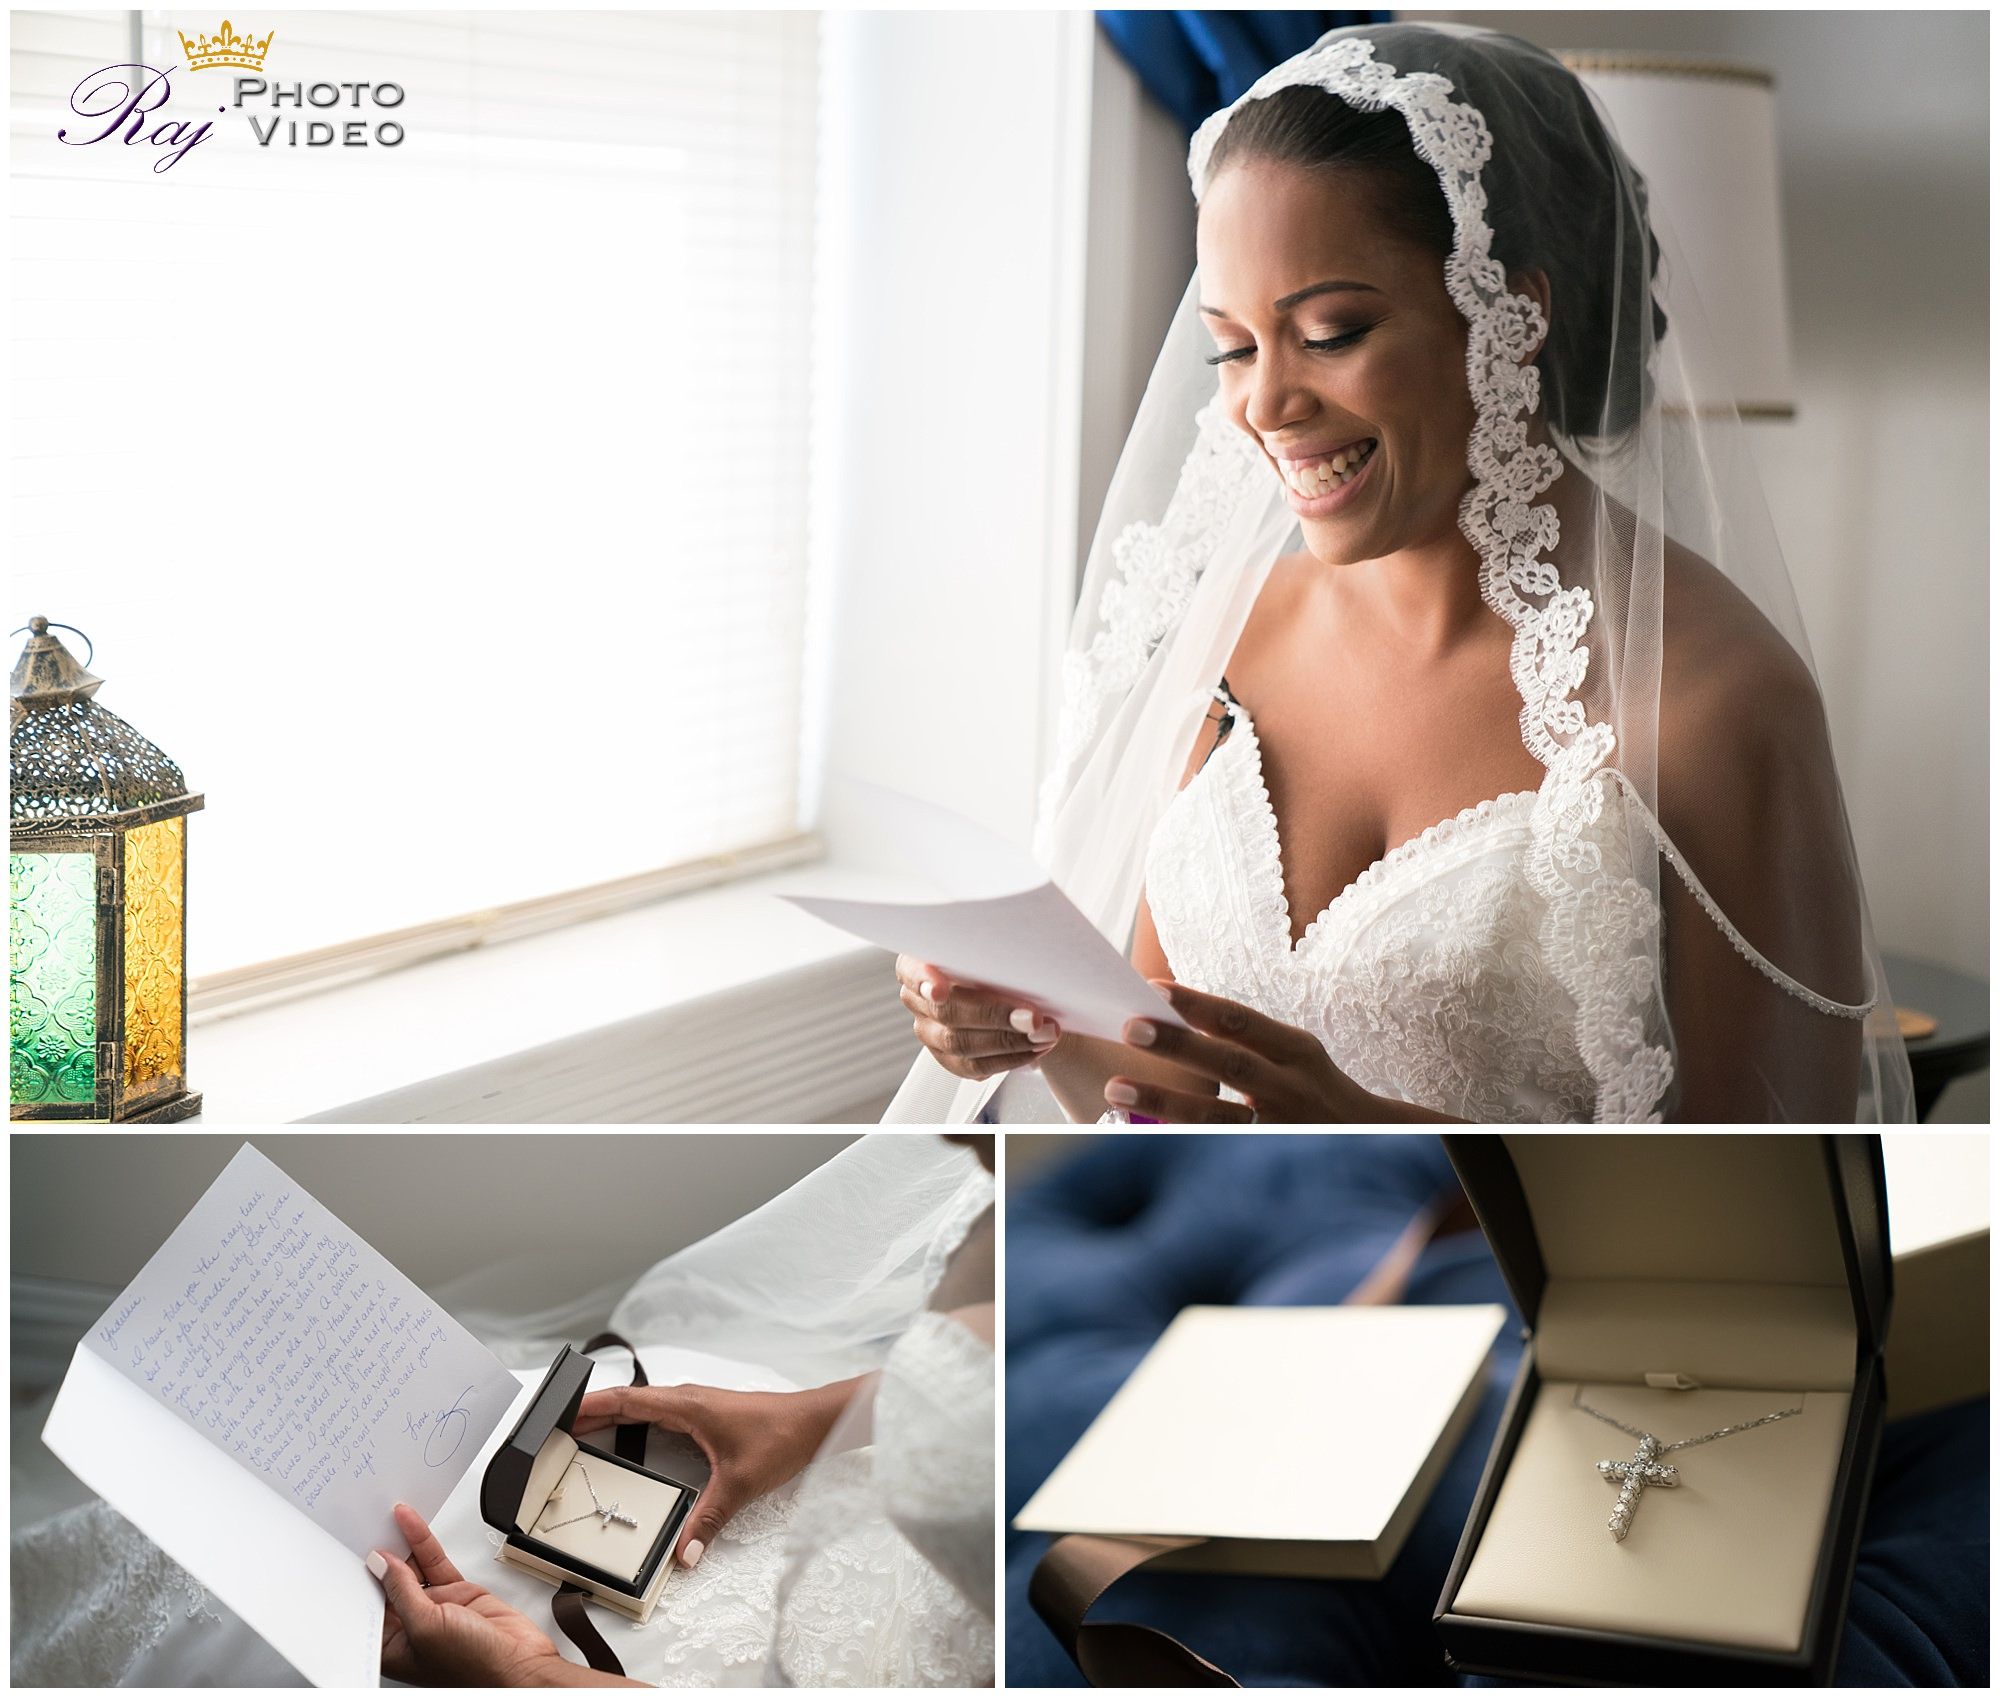 The-Armory-Perth-Amboy-NJ-Catholic-Wedding-Yudelkis-Stephen-6.jpg